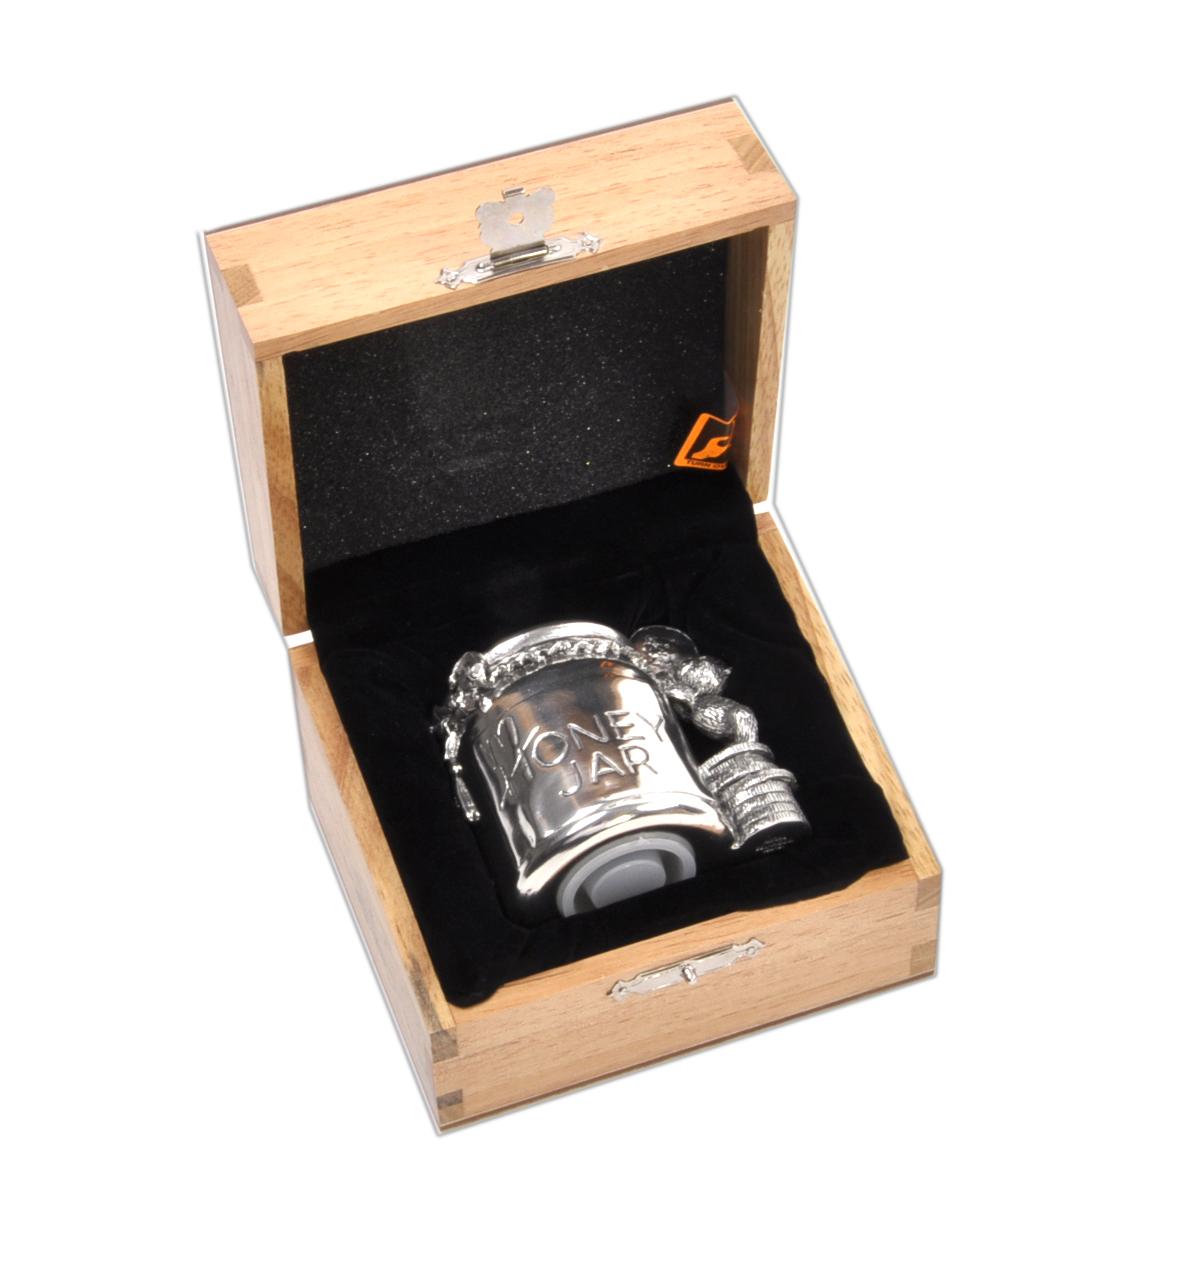 Honey Jar - Pewter Money Box by Royal Selangor in Wooden ...